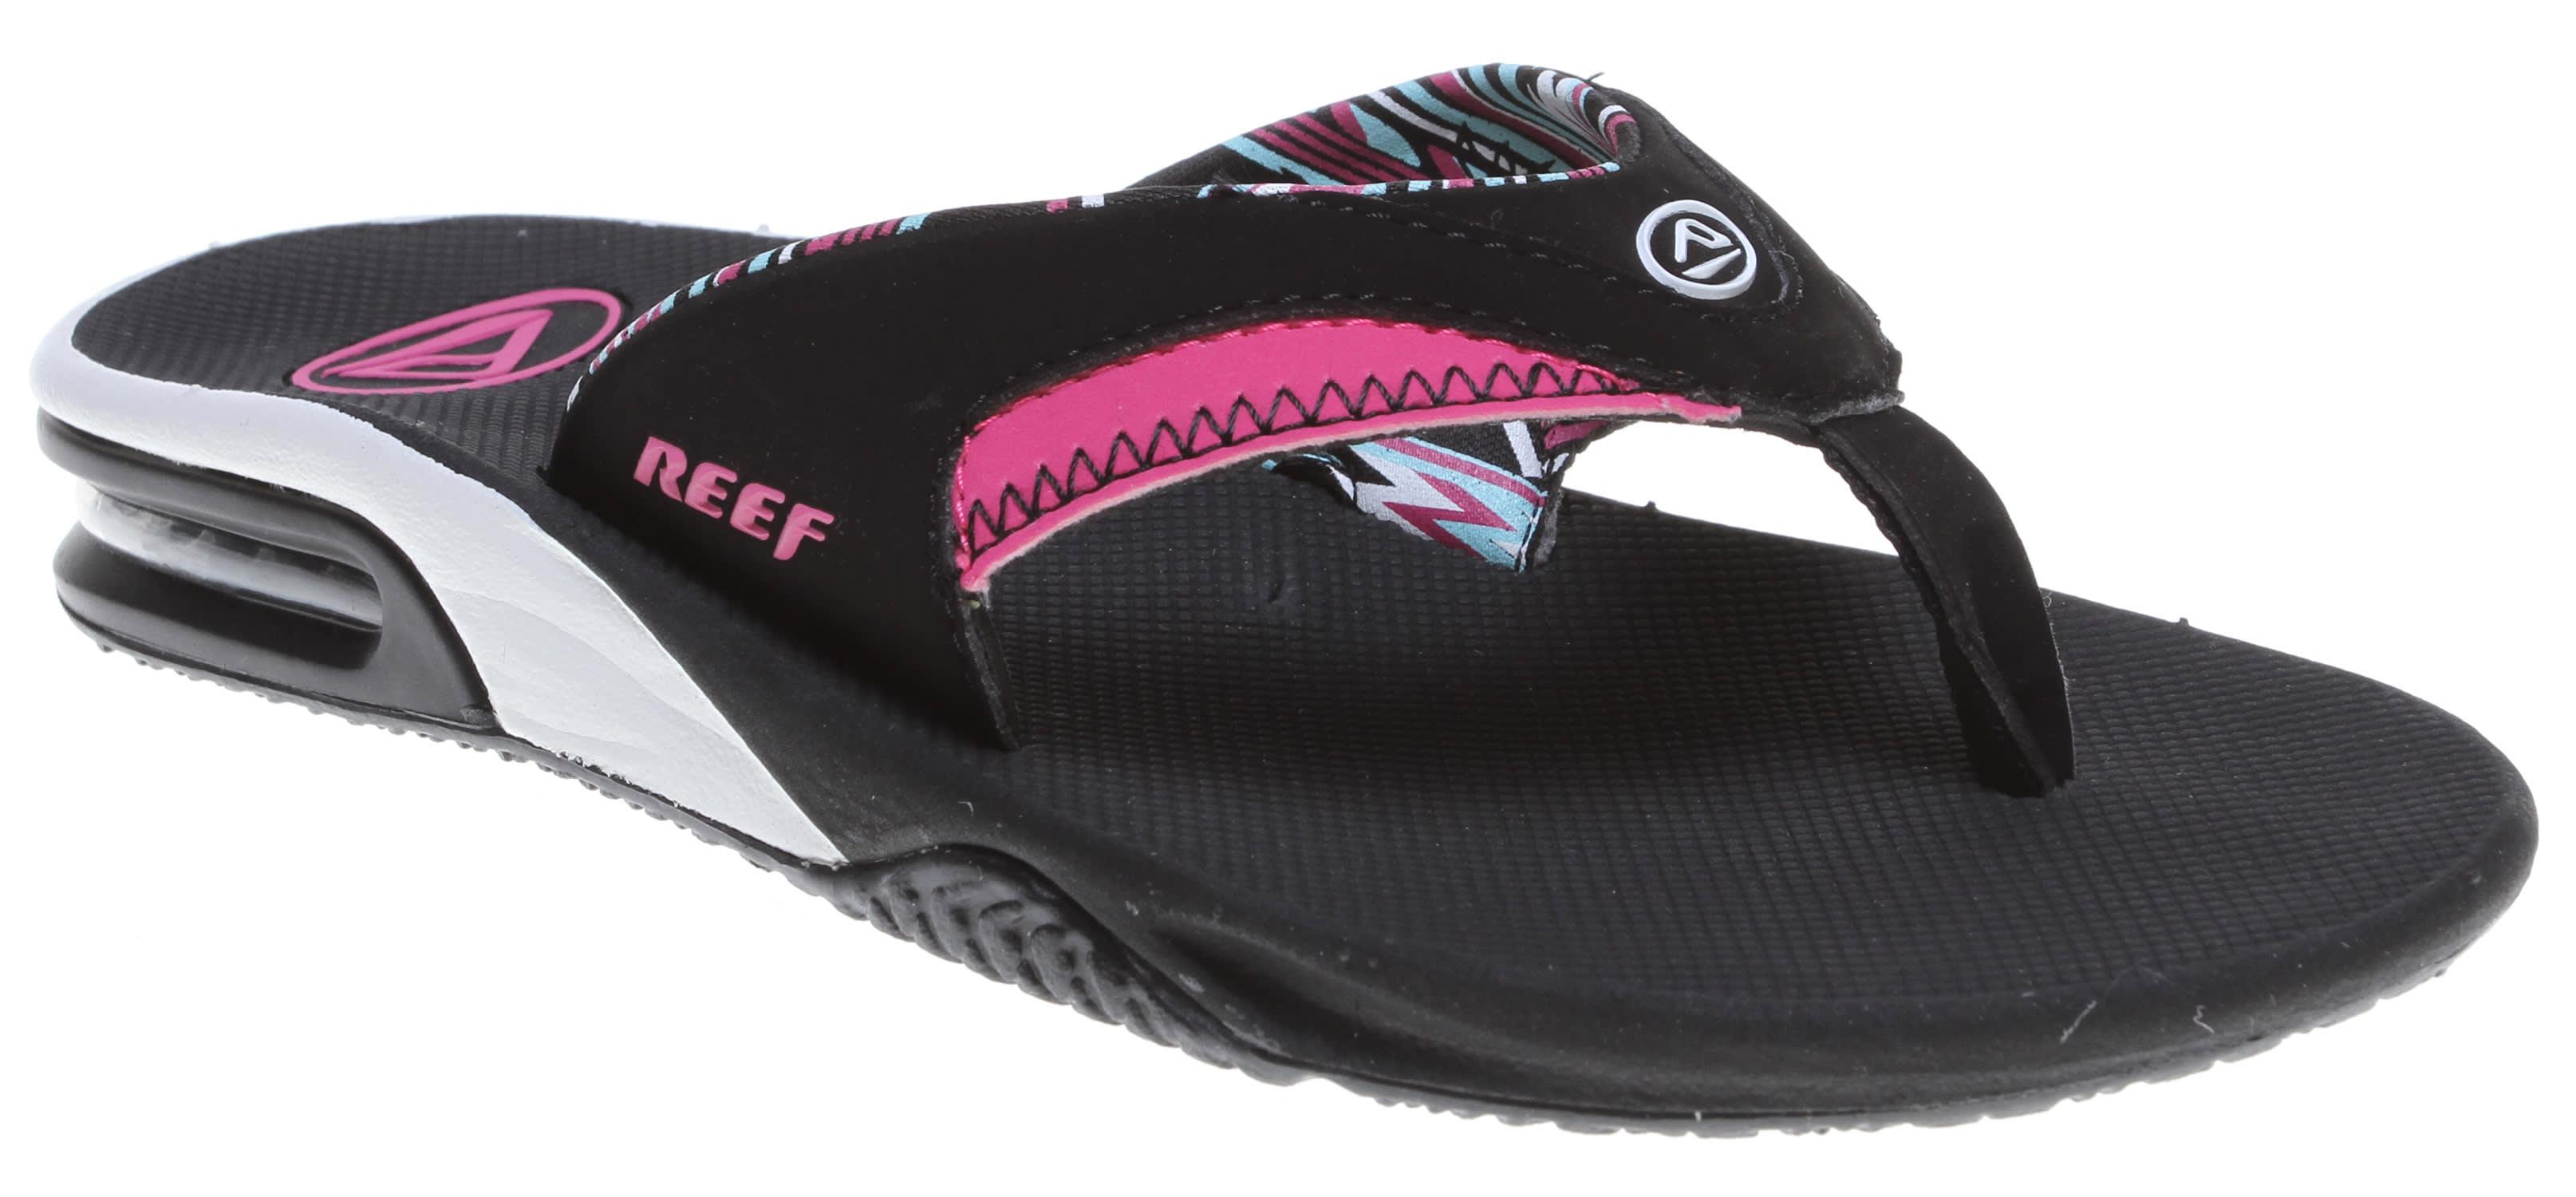 e53851346 Reef Fanning Sandals - thumbnail 2